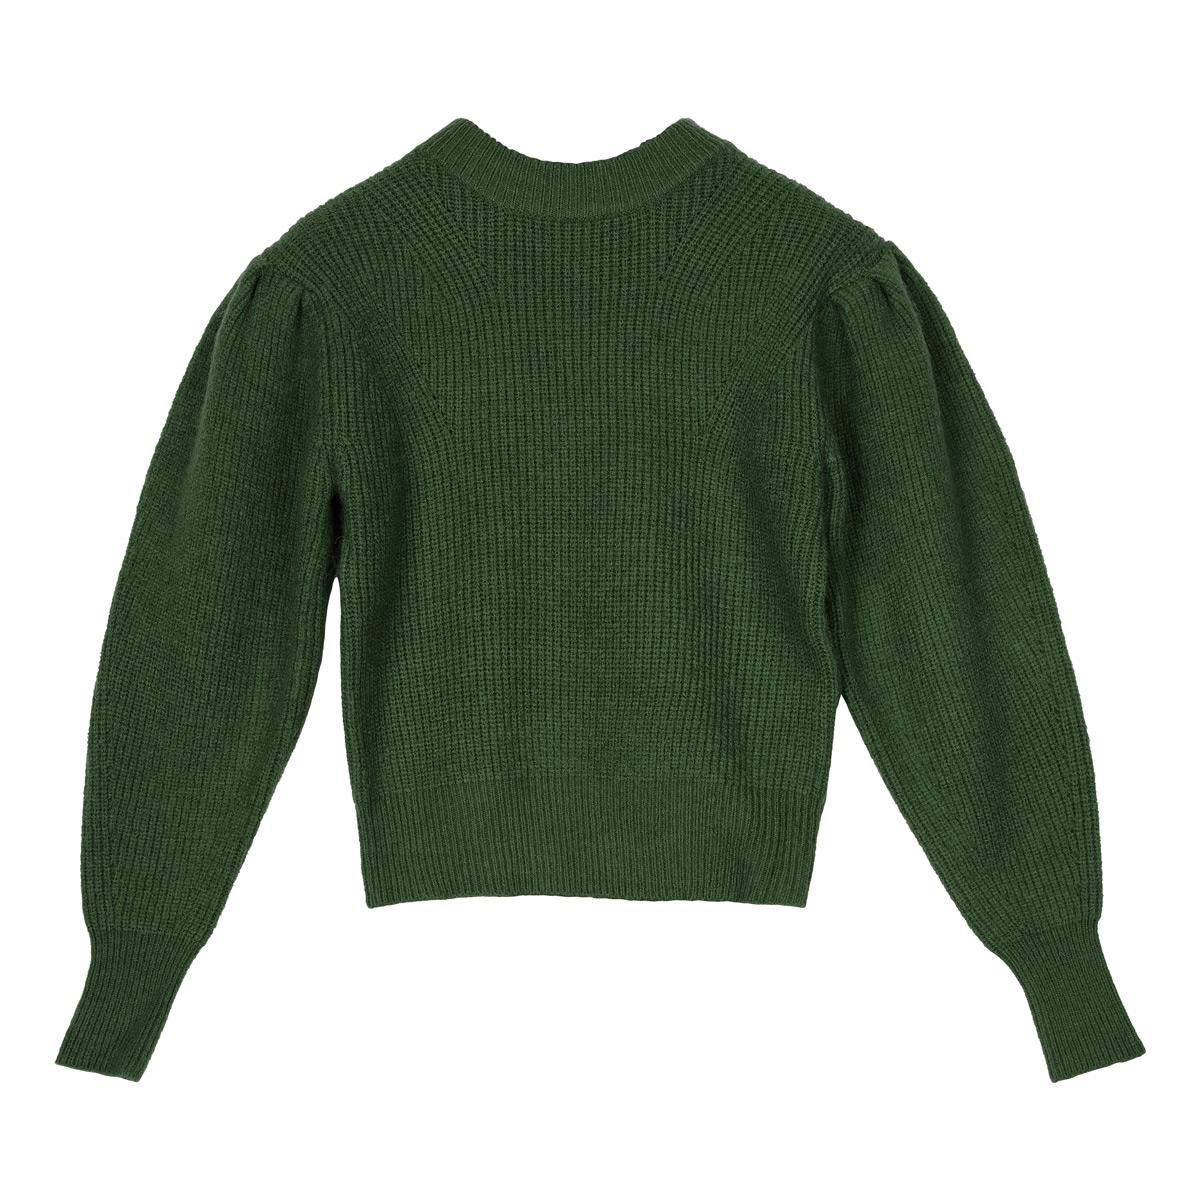 Sweatshirt moody